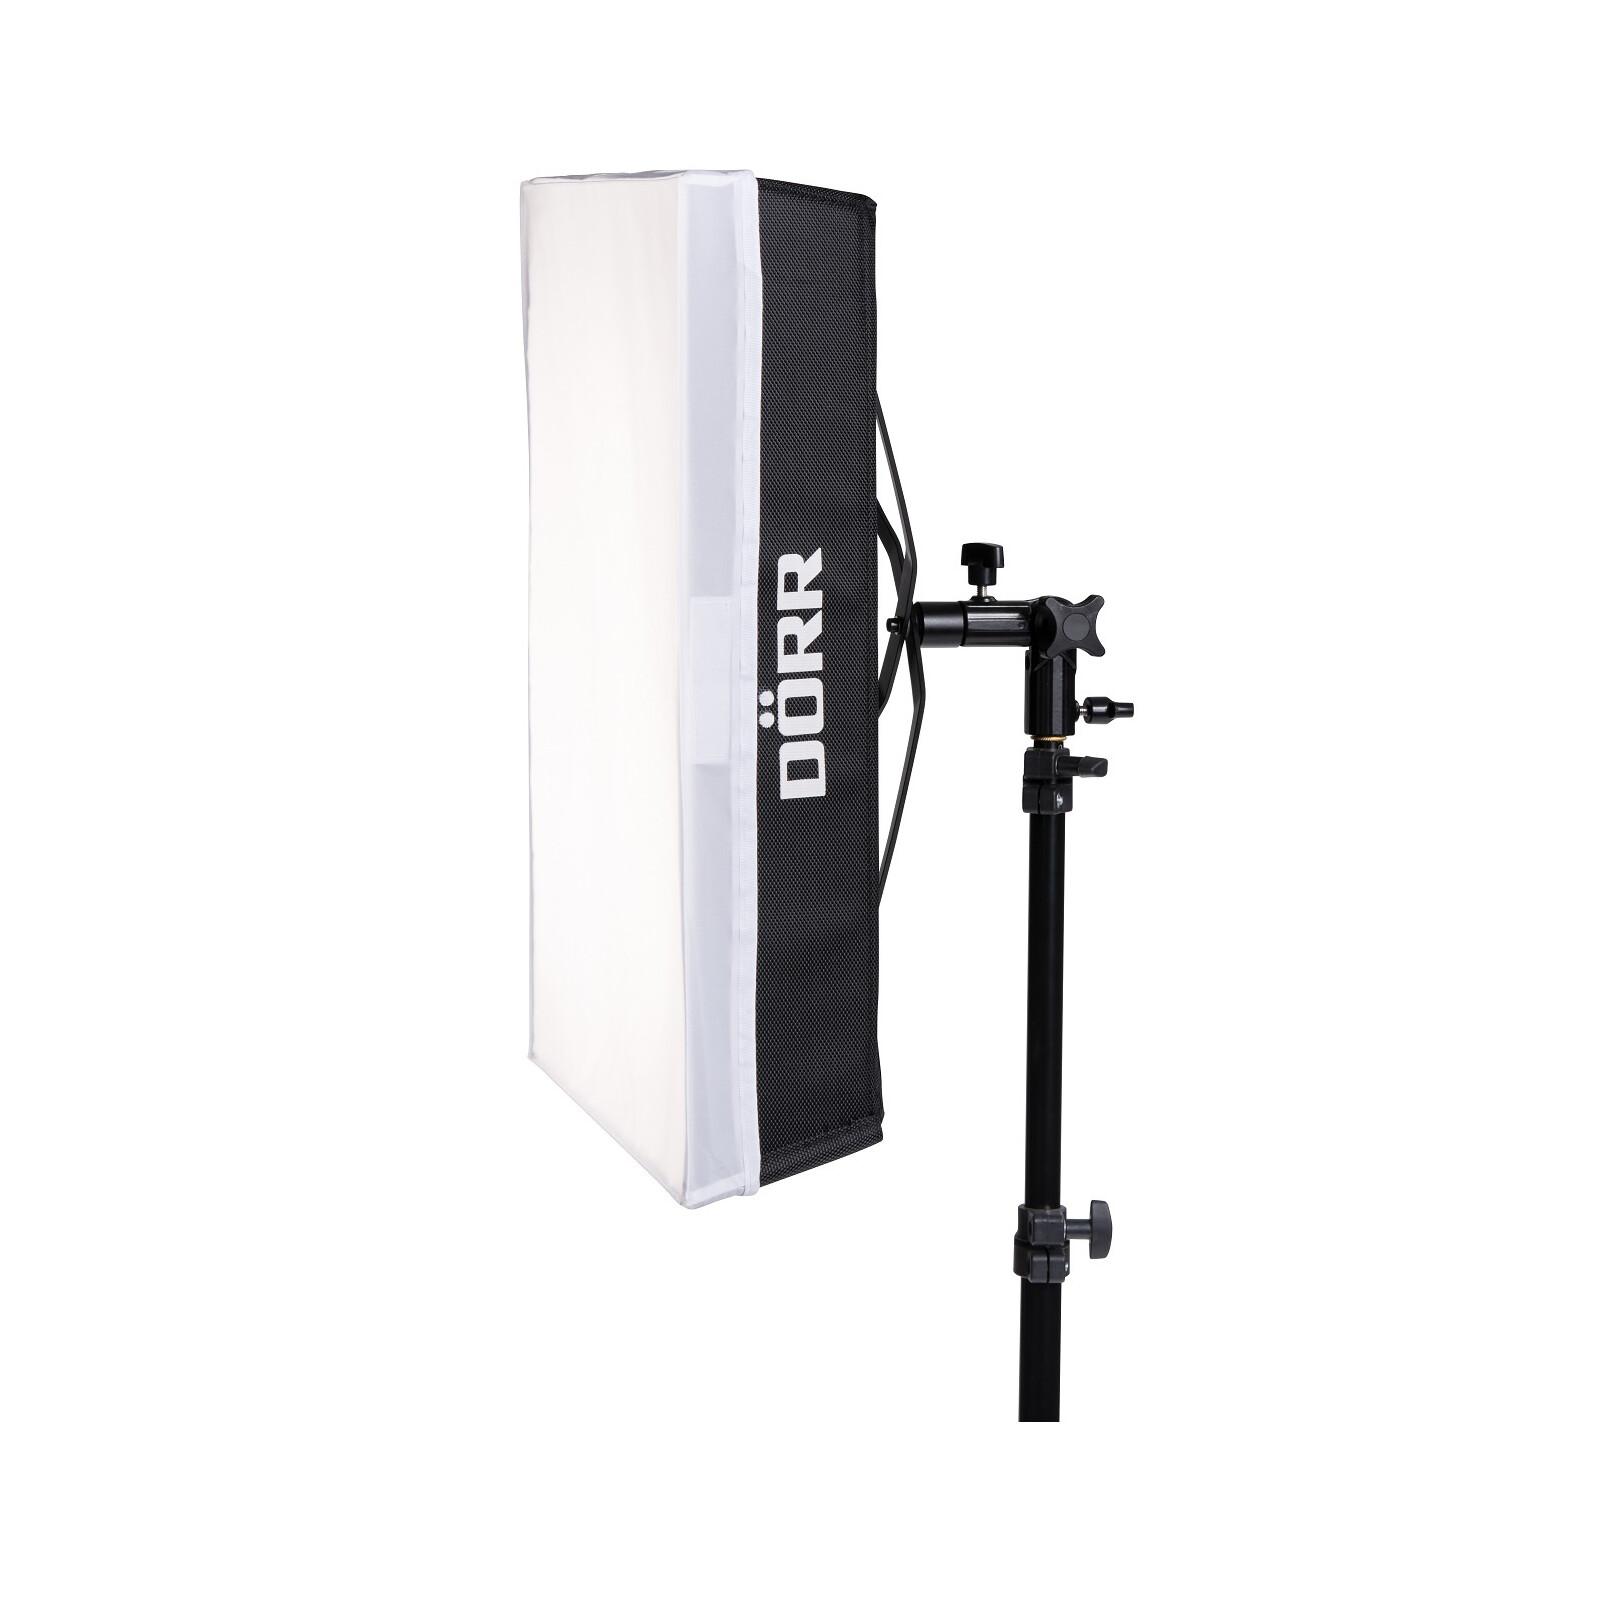 Dörr Softbox für FX-4555 DL/BC